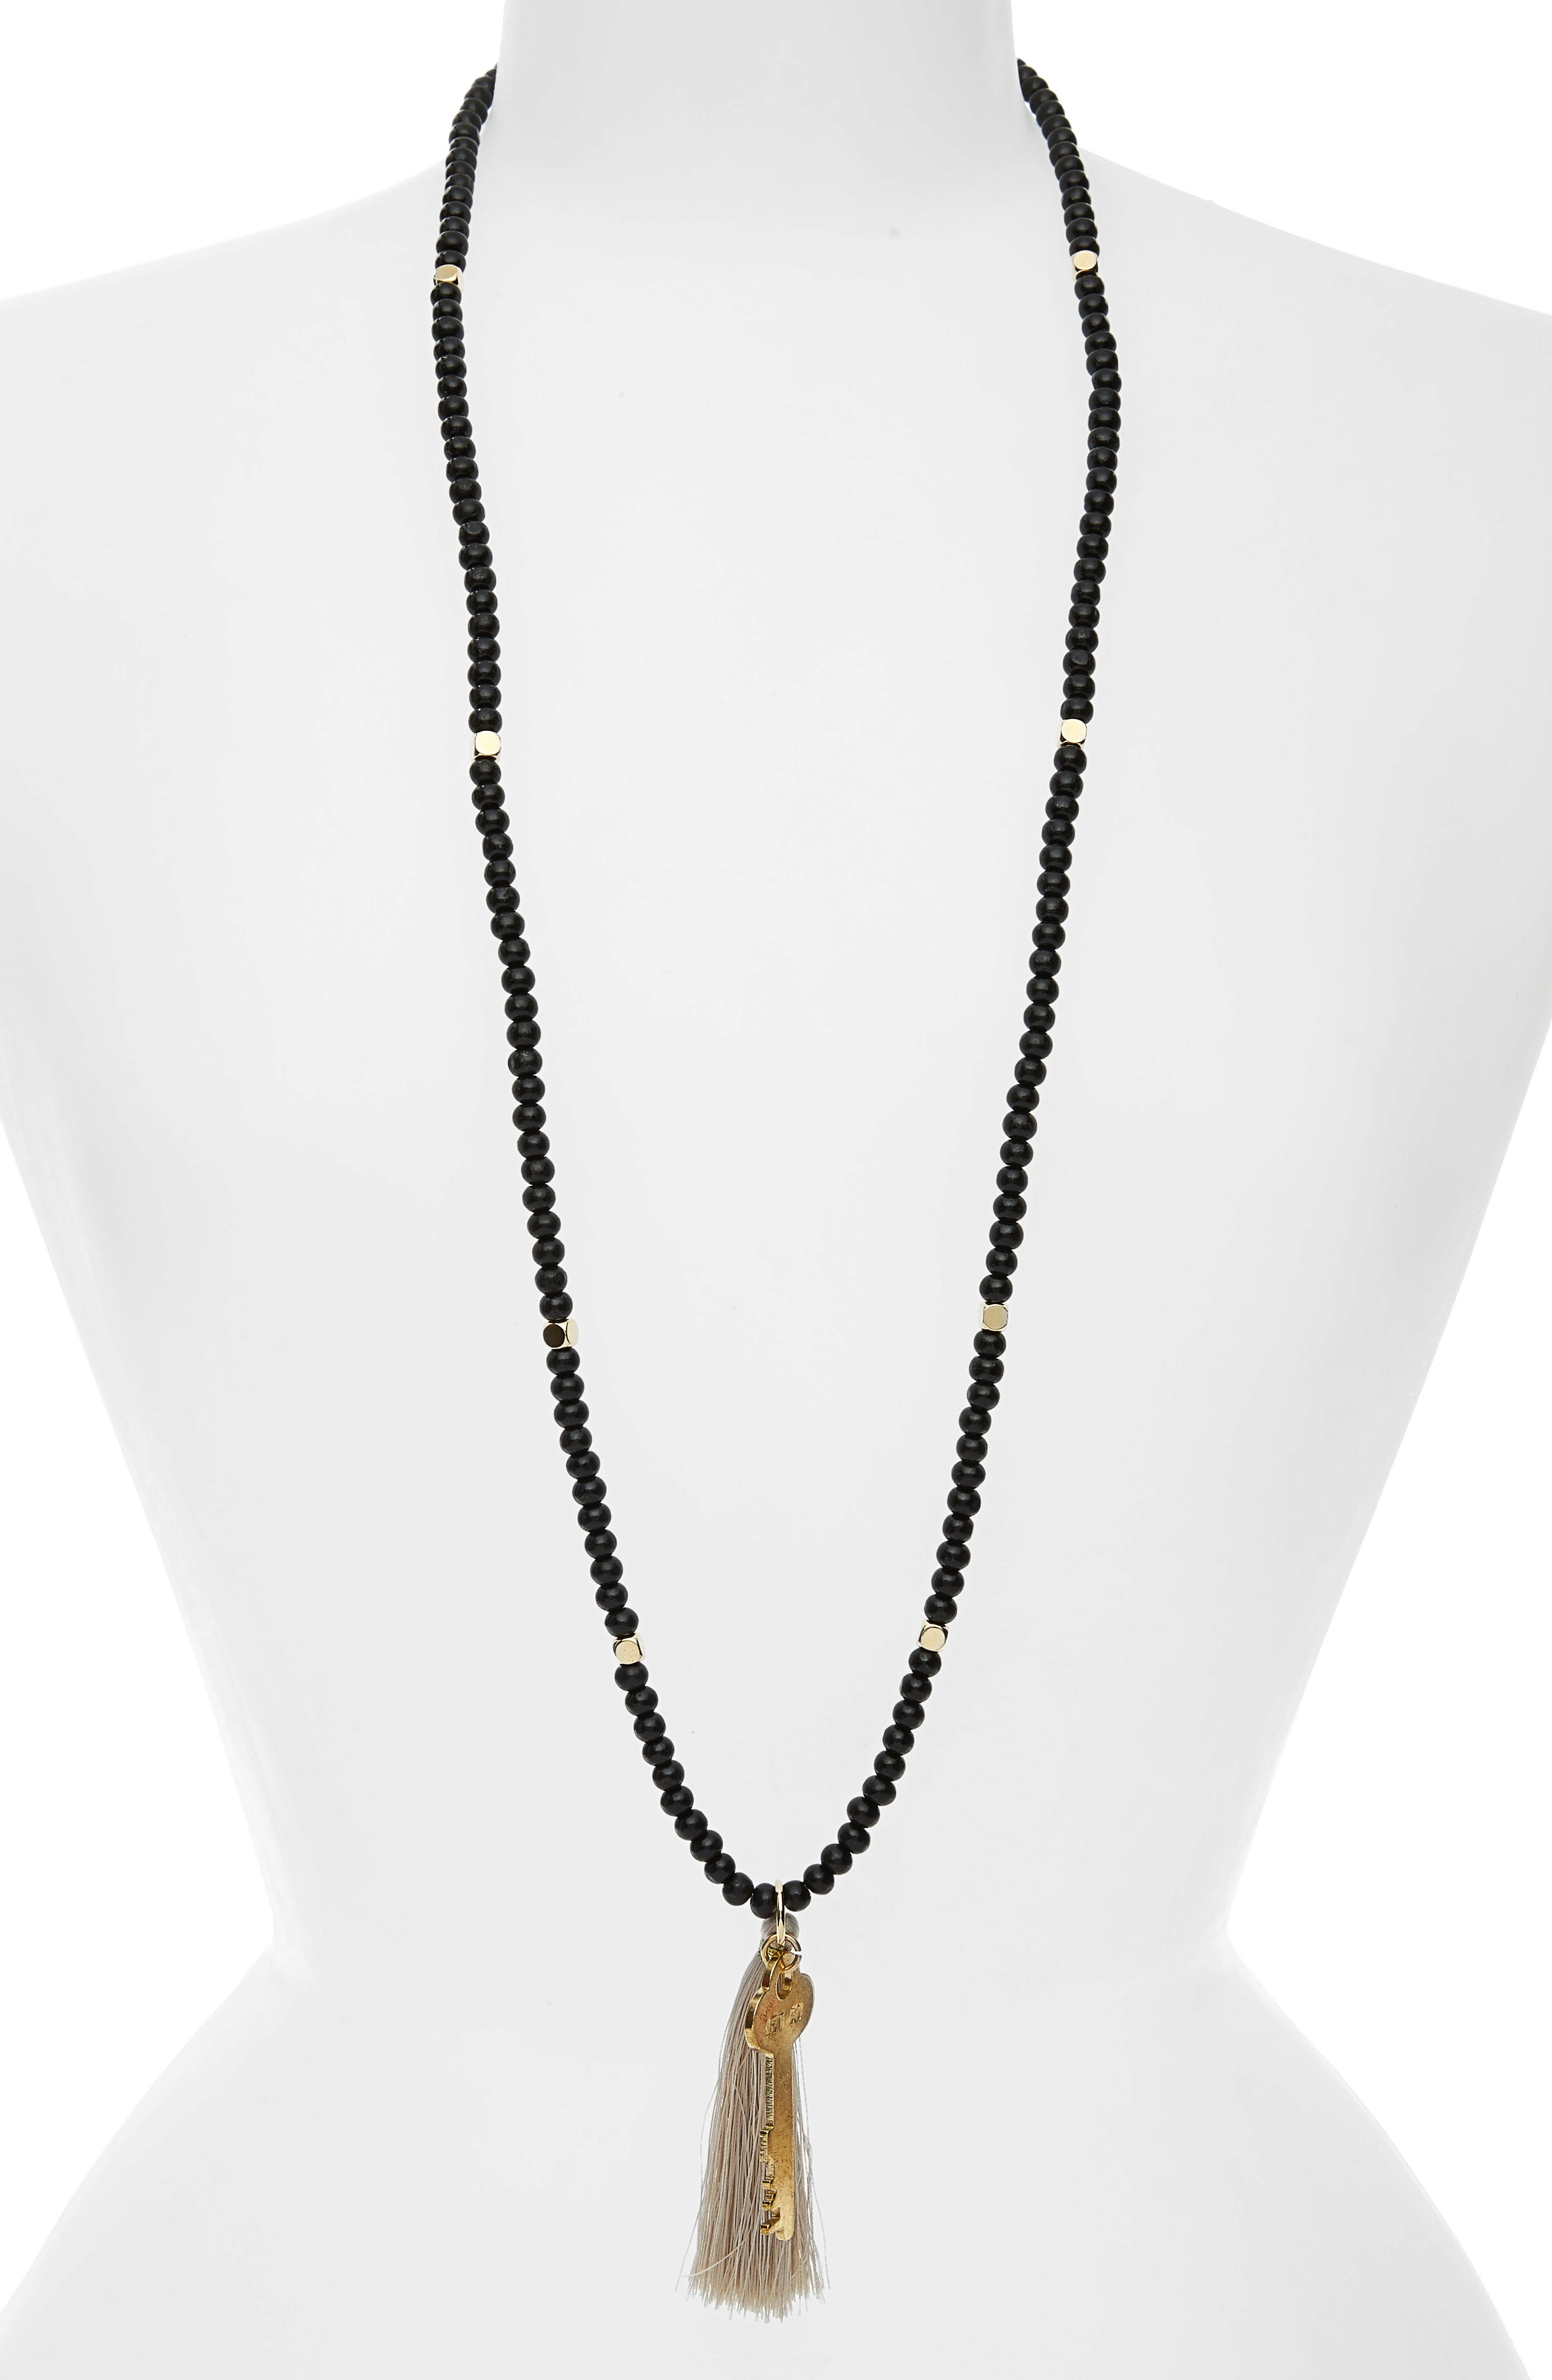 Inspiration Key Charm & Tassel Beaded Necklace,                         Main,                         color, Ebony/ Gold- Let Go